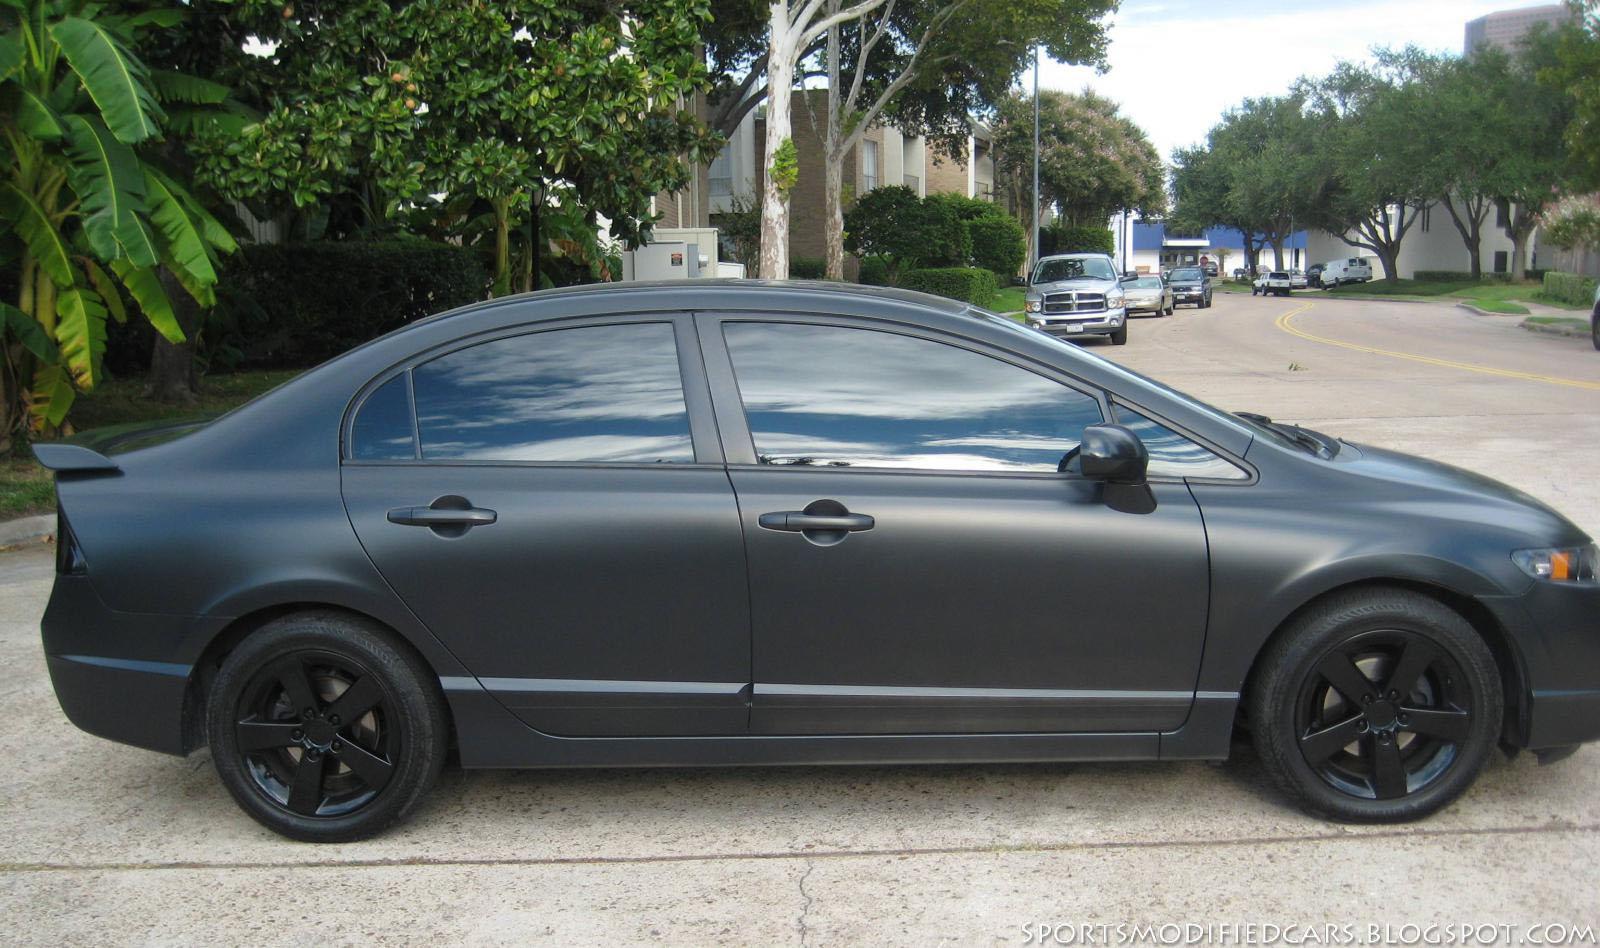 Matte black civic sports modified cars for Honda black car